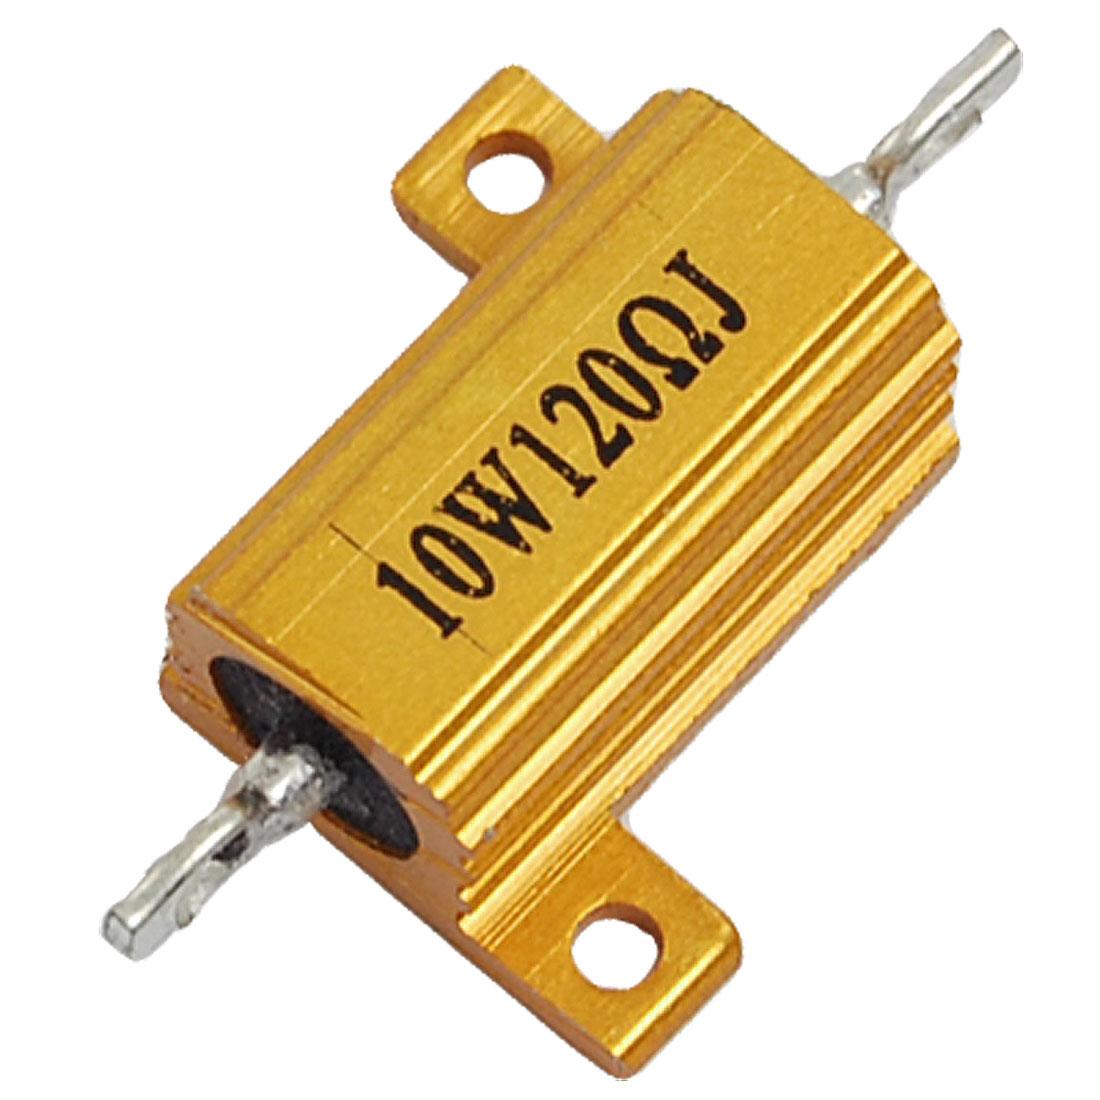 Unique Bargains Screw Tabs Aluminum Sheel Resistor 120 Ohm 5% Gold Tone - image 1 de 1